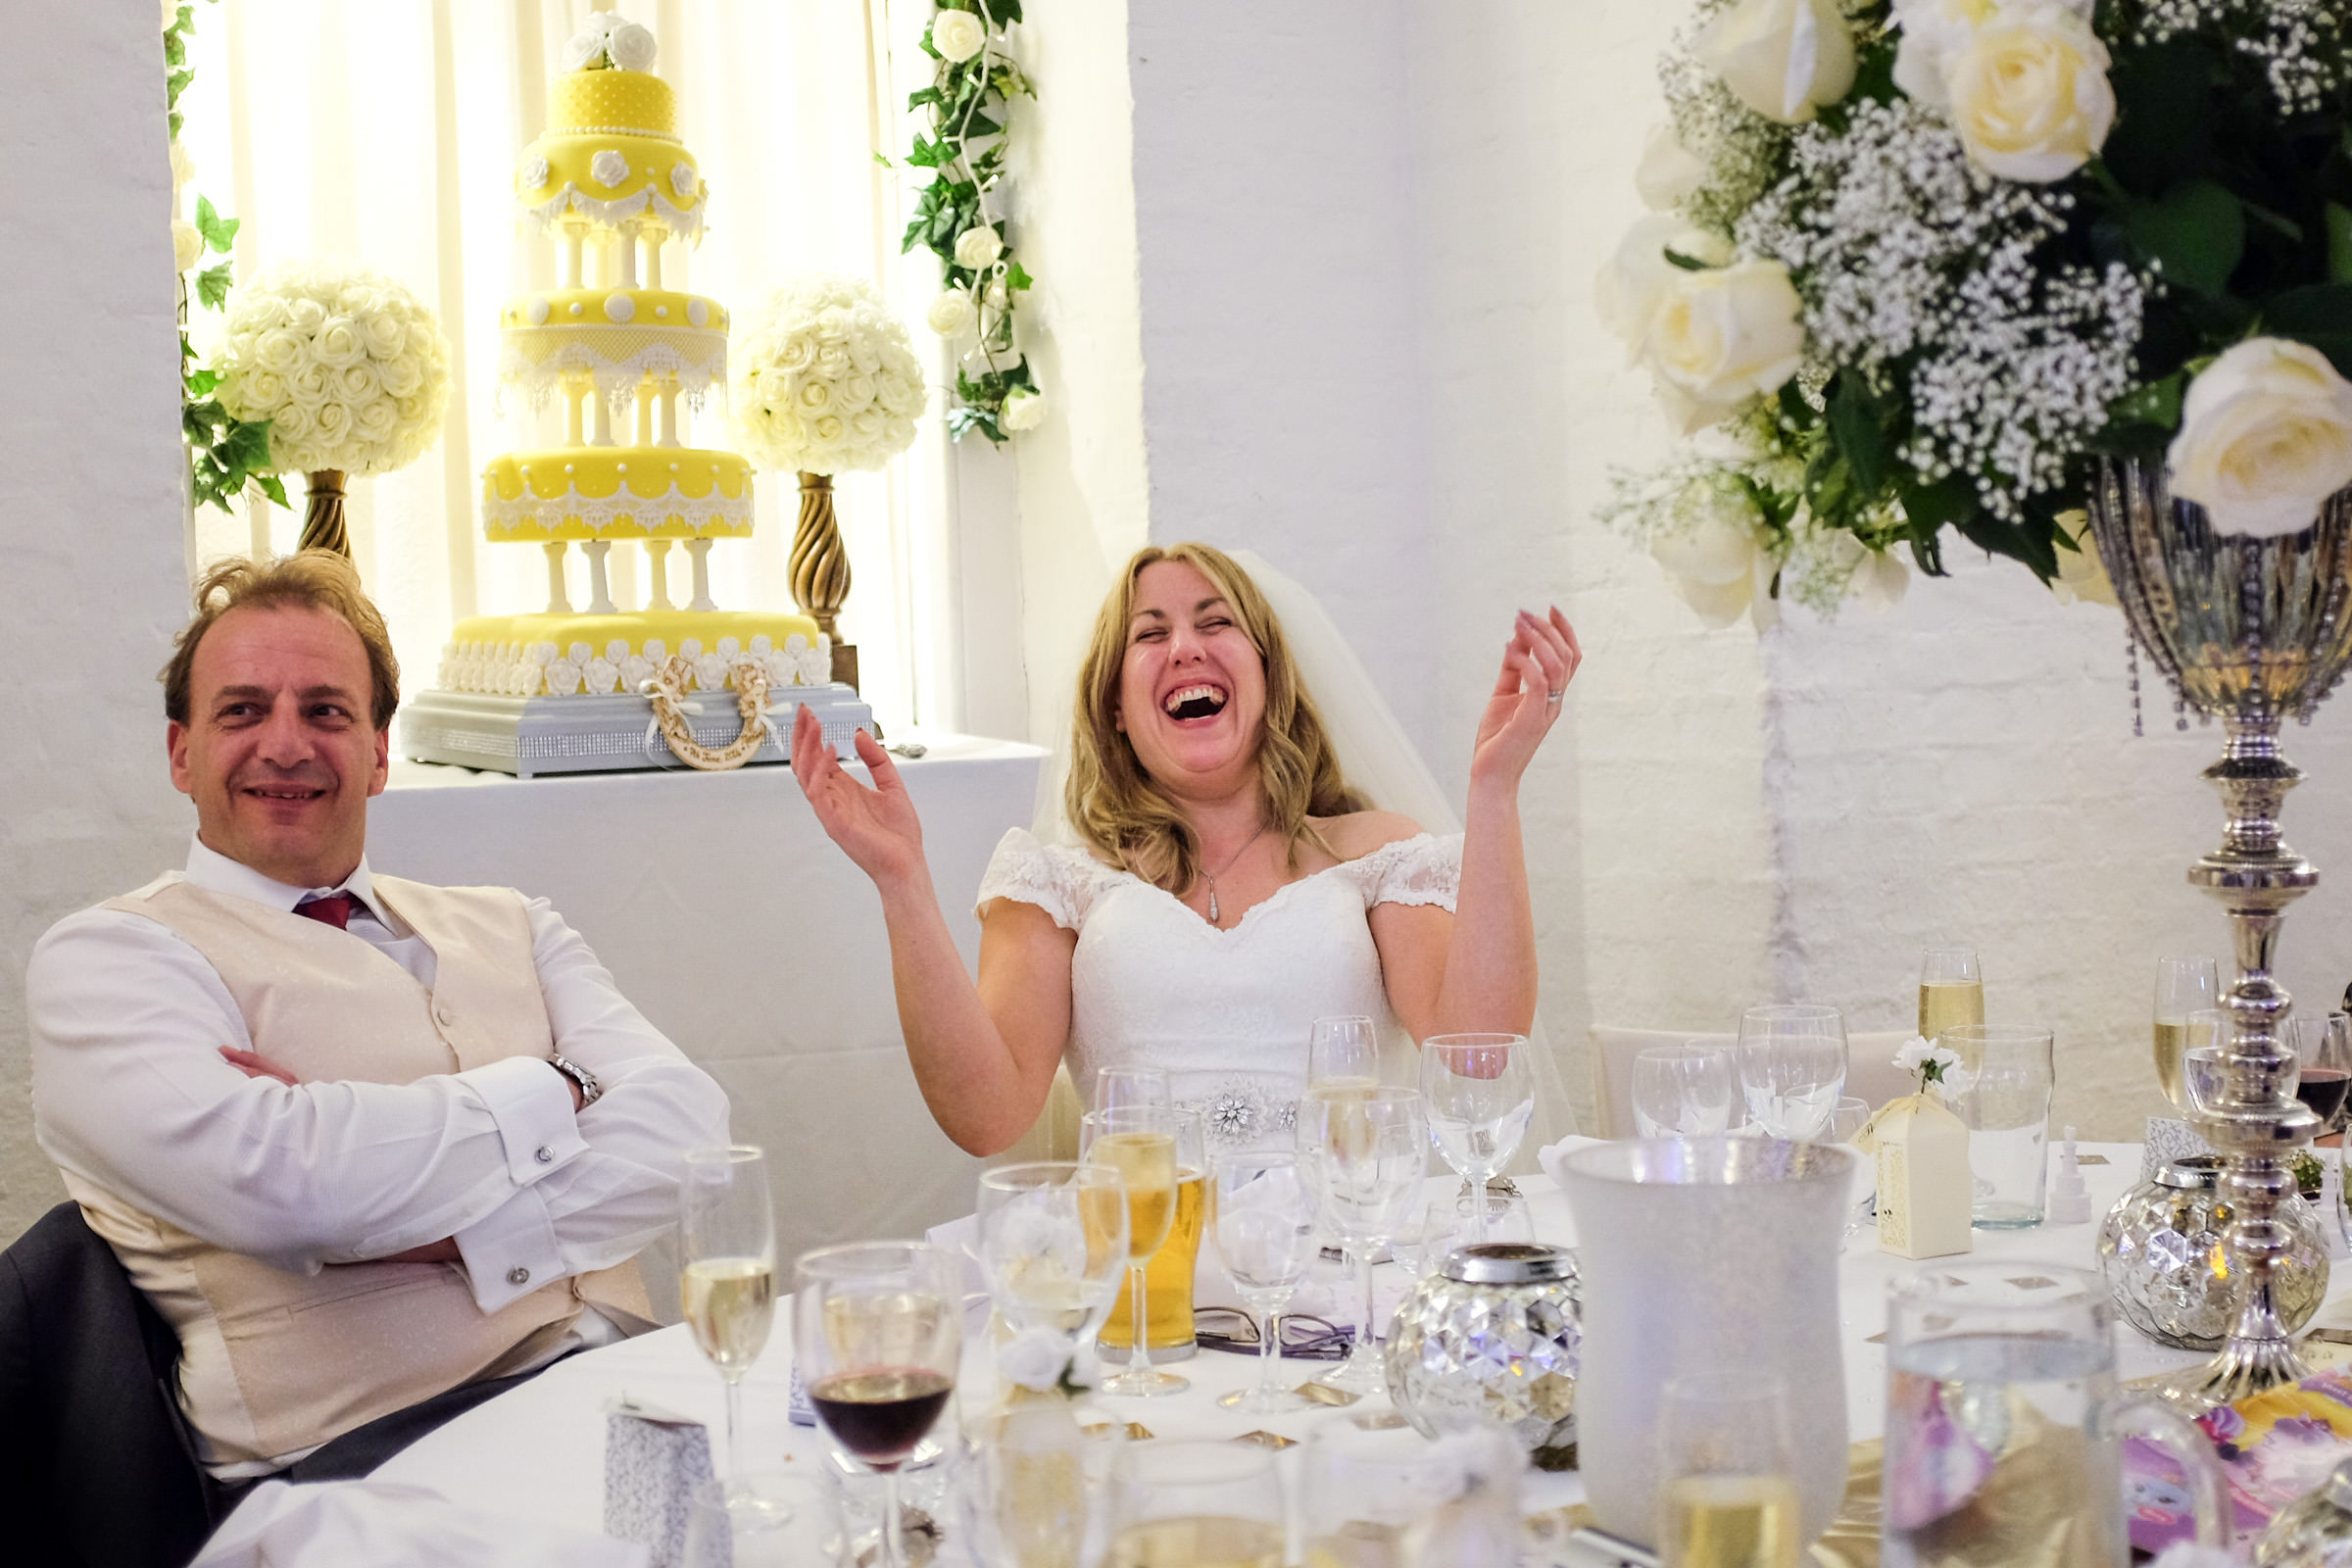 Wedding at Clandon Park in Guildford 018.jpg